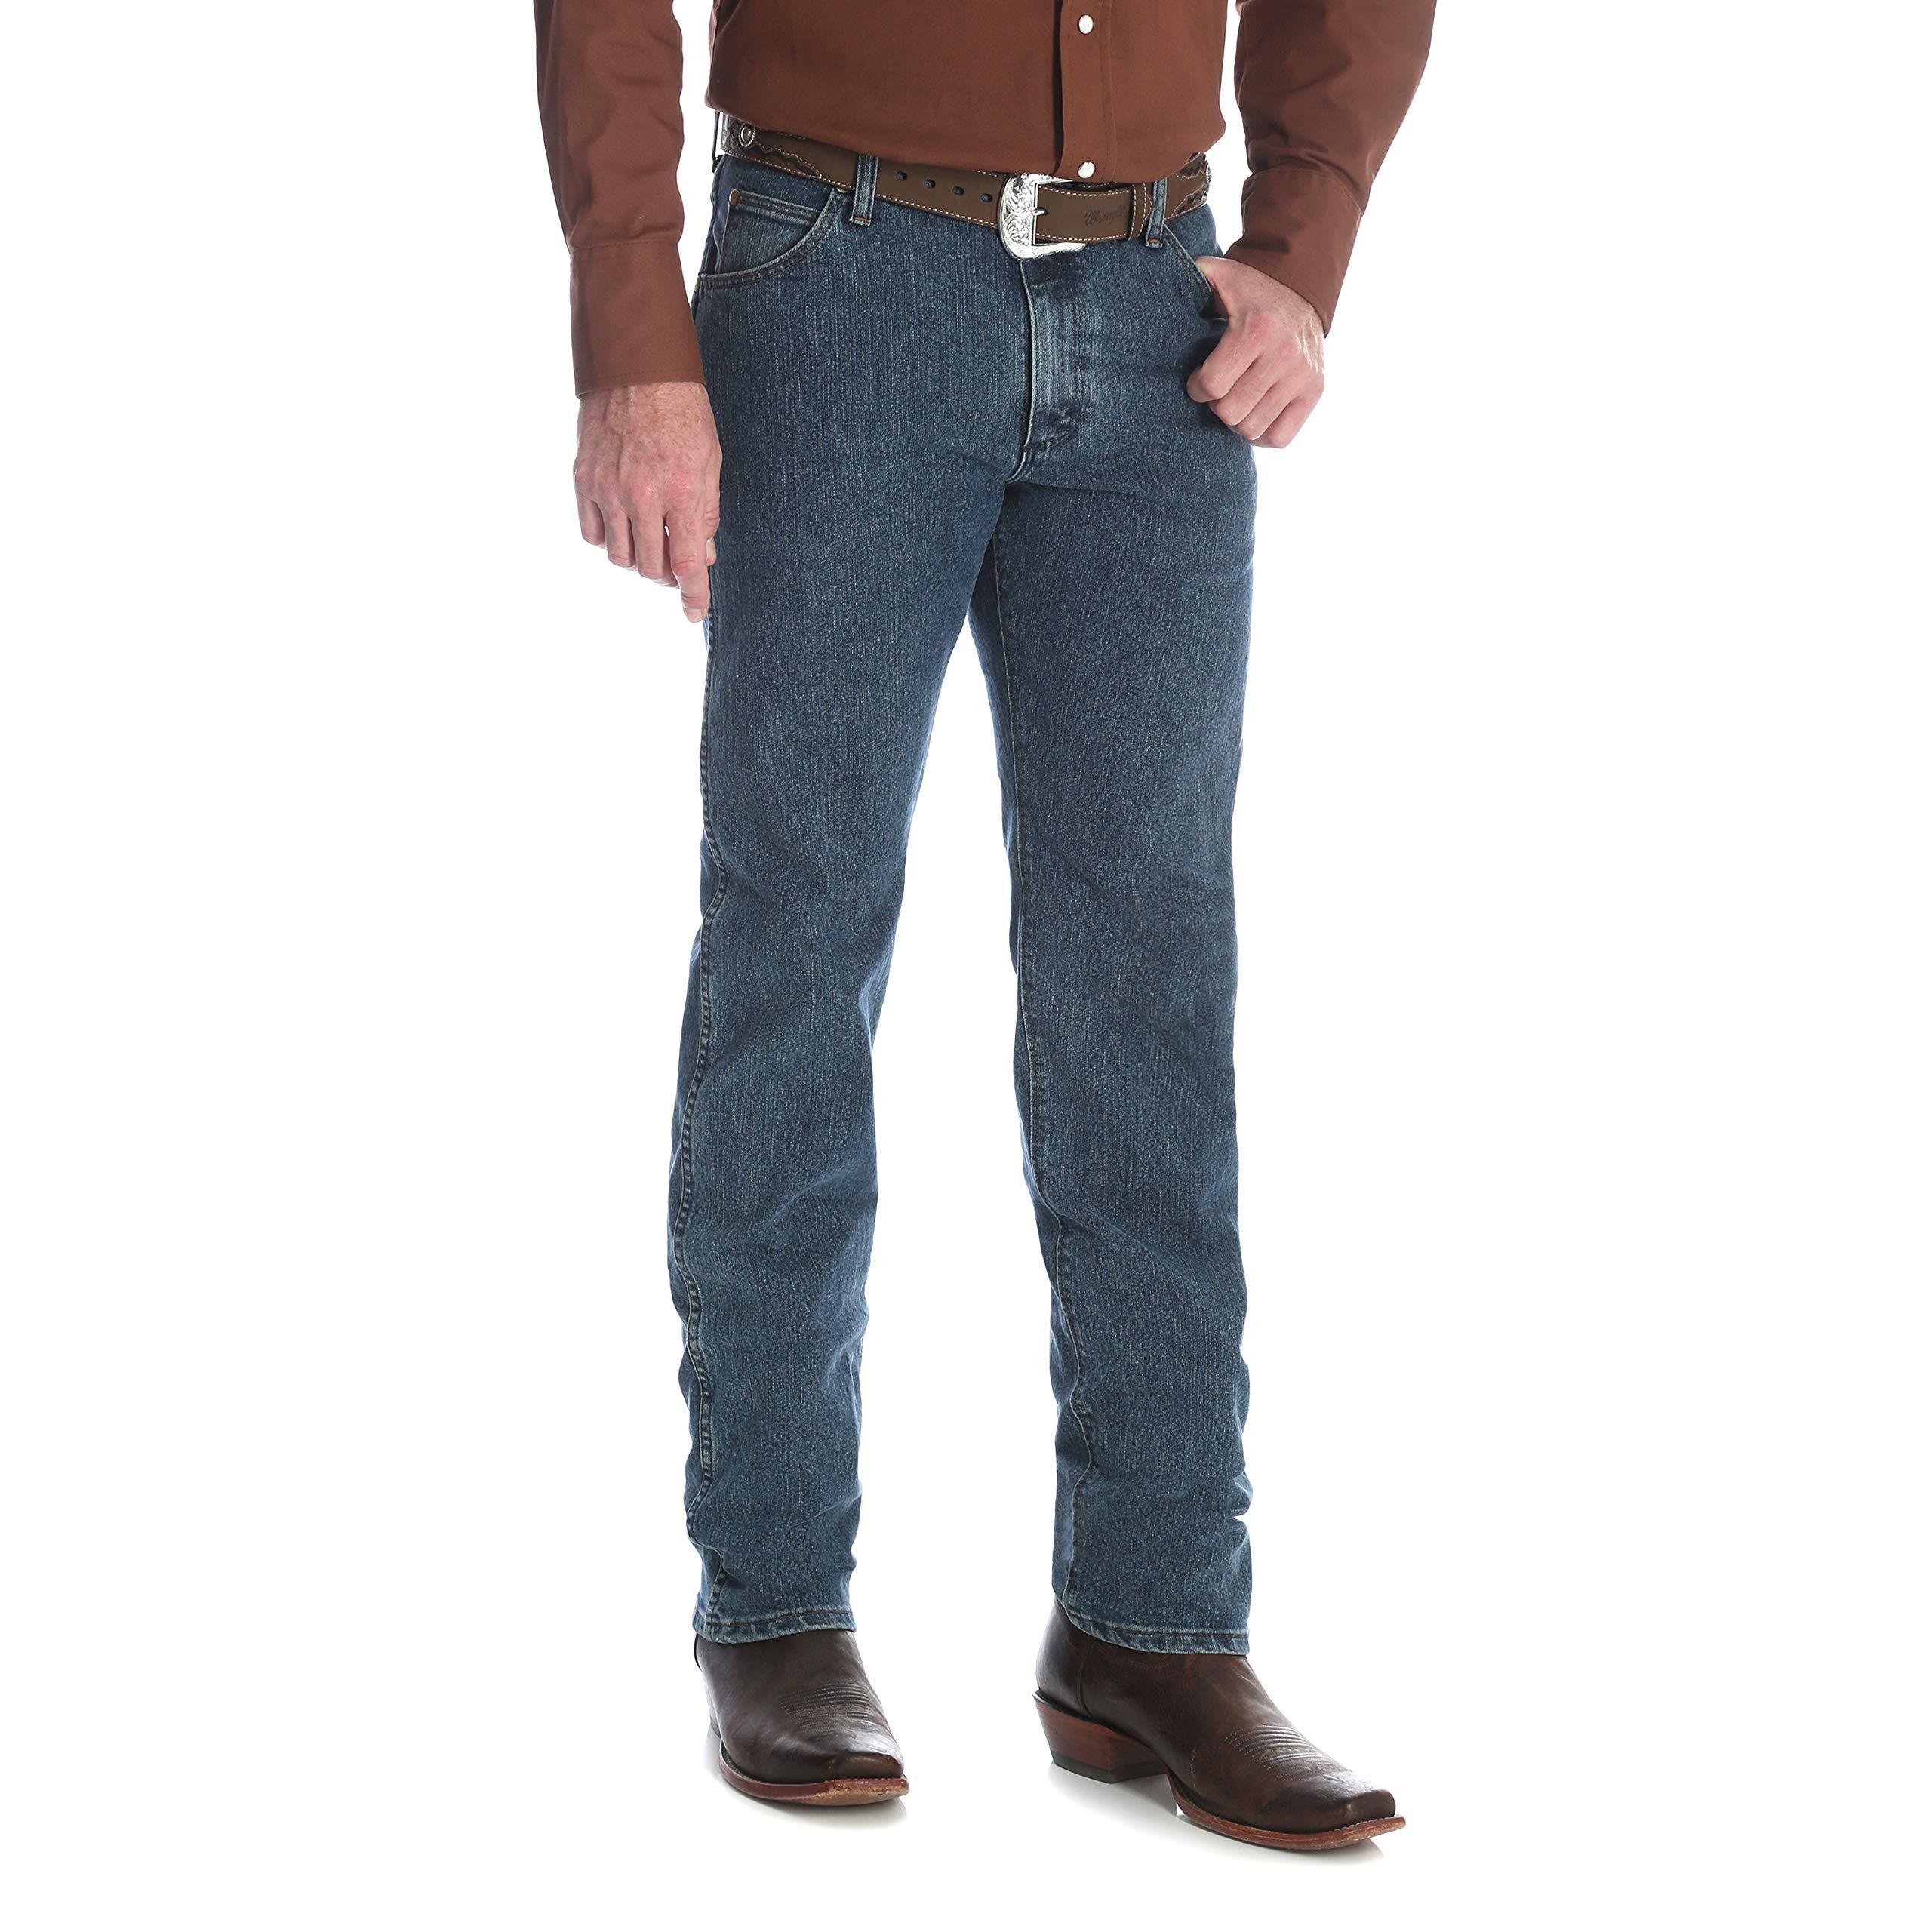 ddfbe4c0 Galleon - Wrangler Men's Premium Performance Cowboy Cut Regular Fit Jean, Vintage  Stone, 35X30